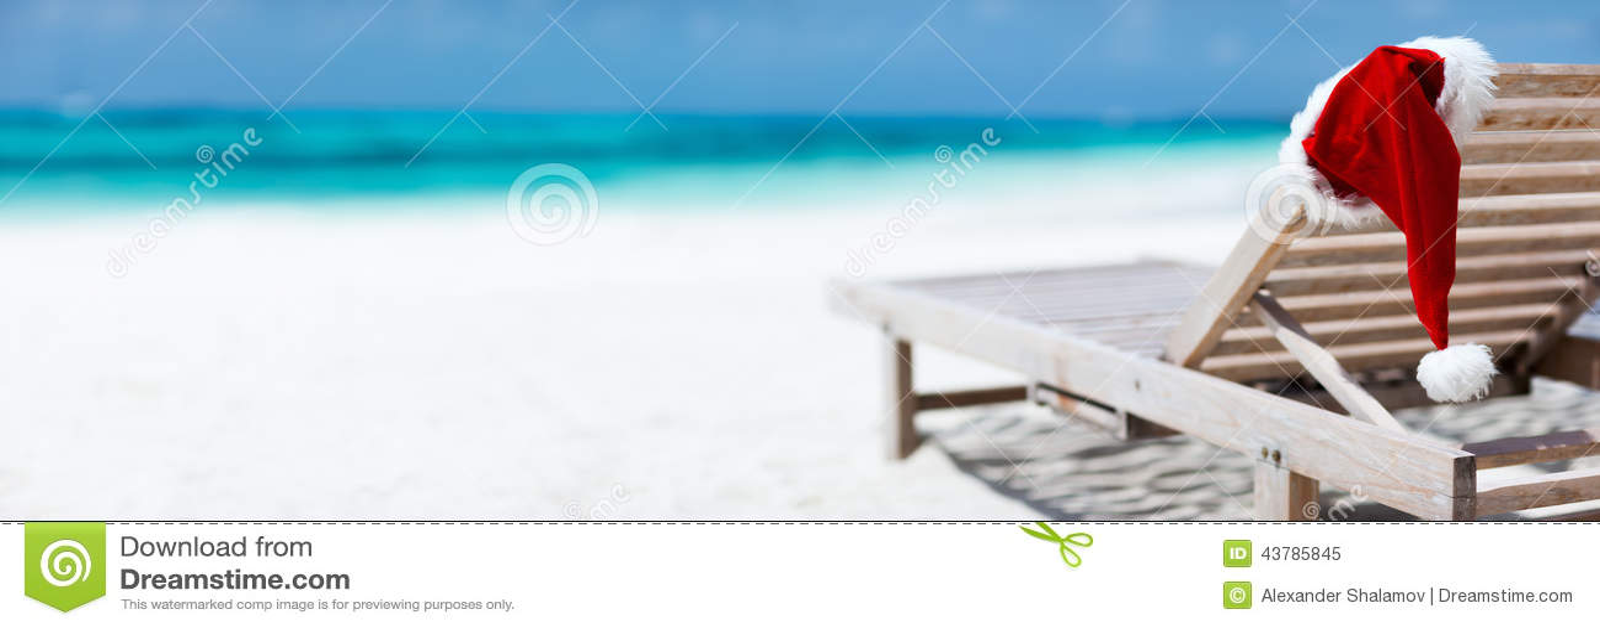 Christmas Beach Vacation Stock Photo Image 43785845